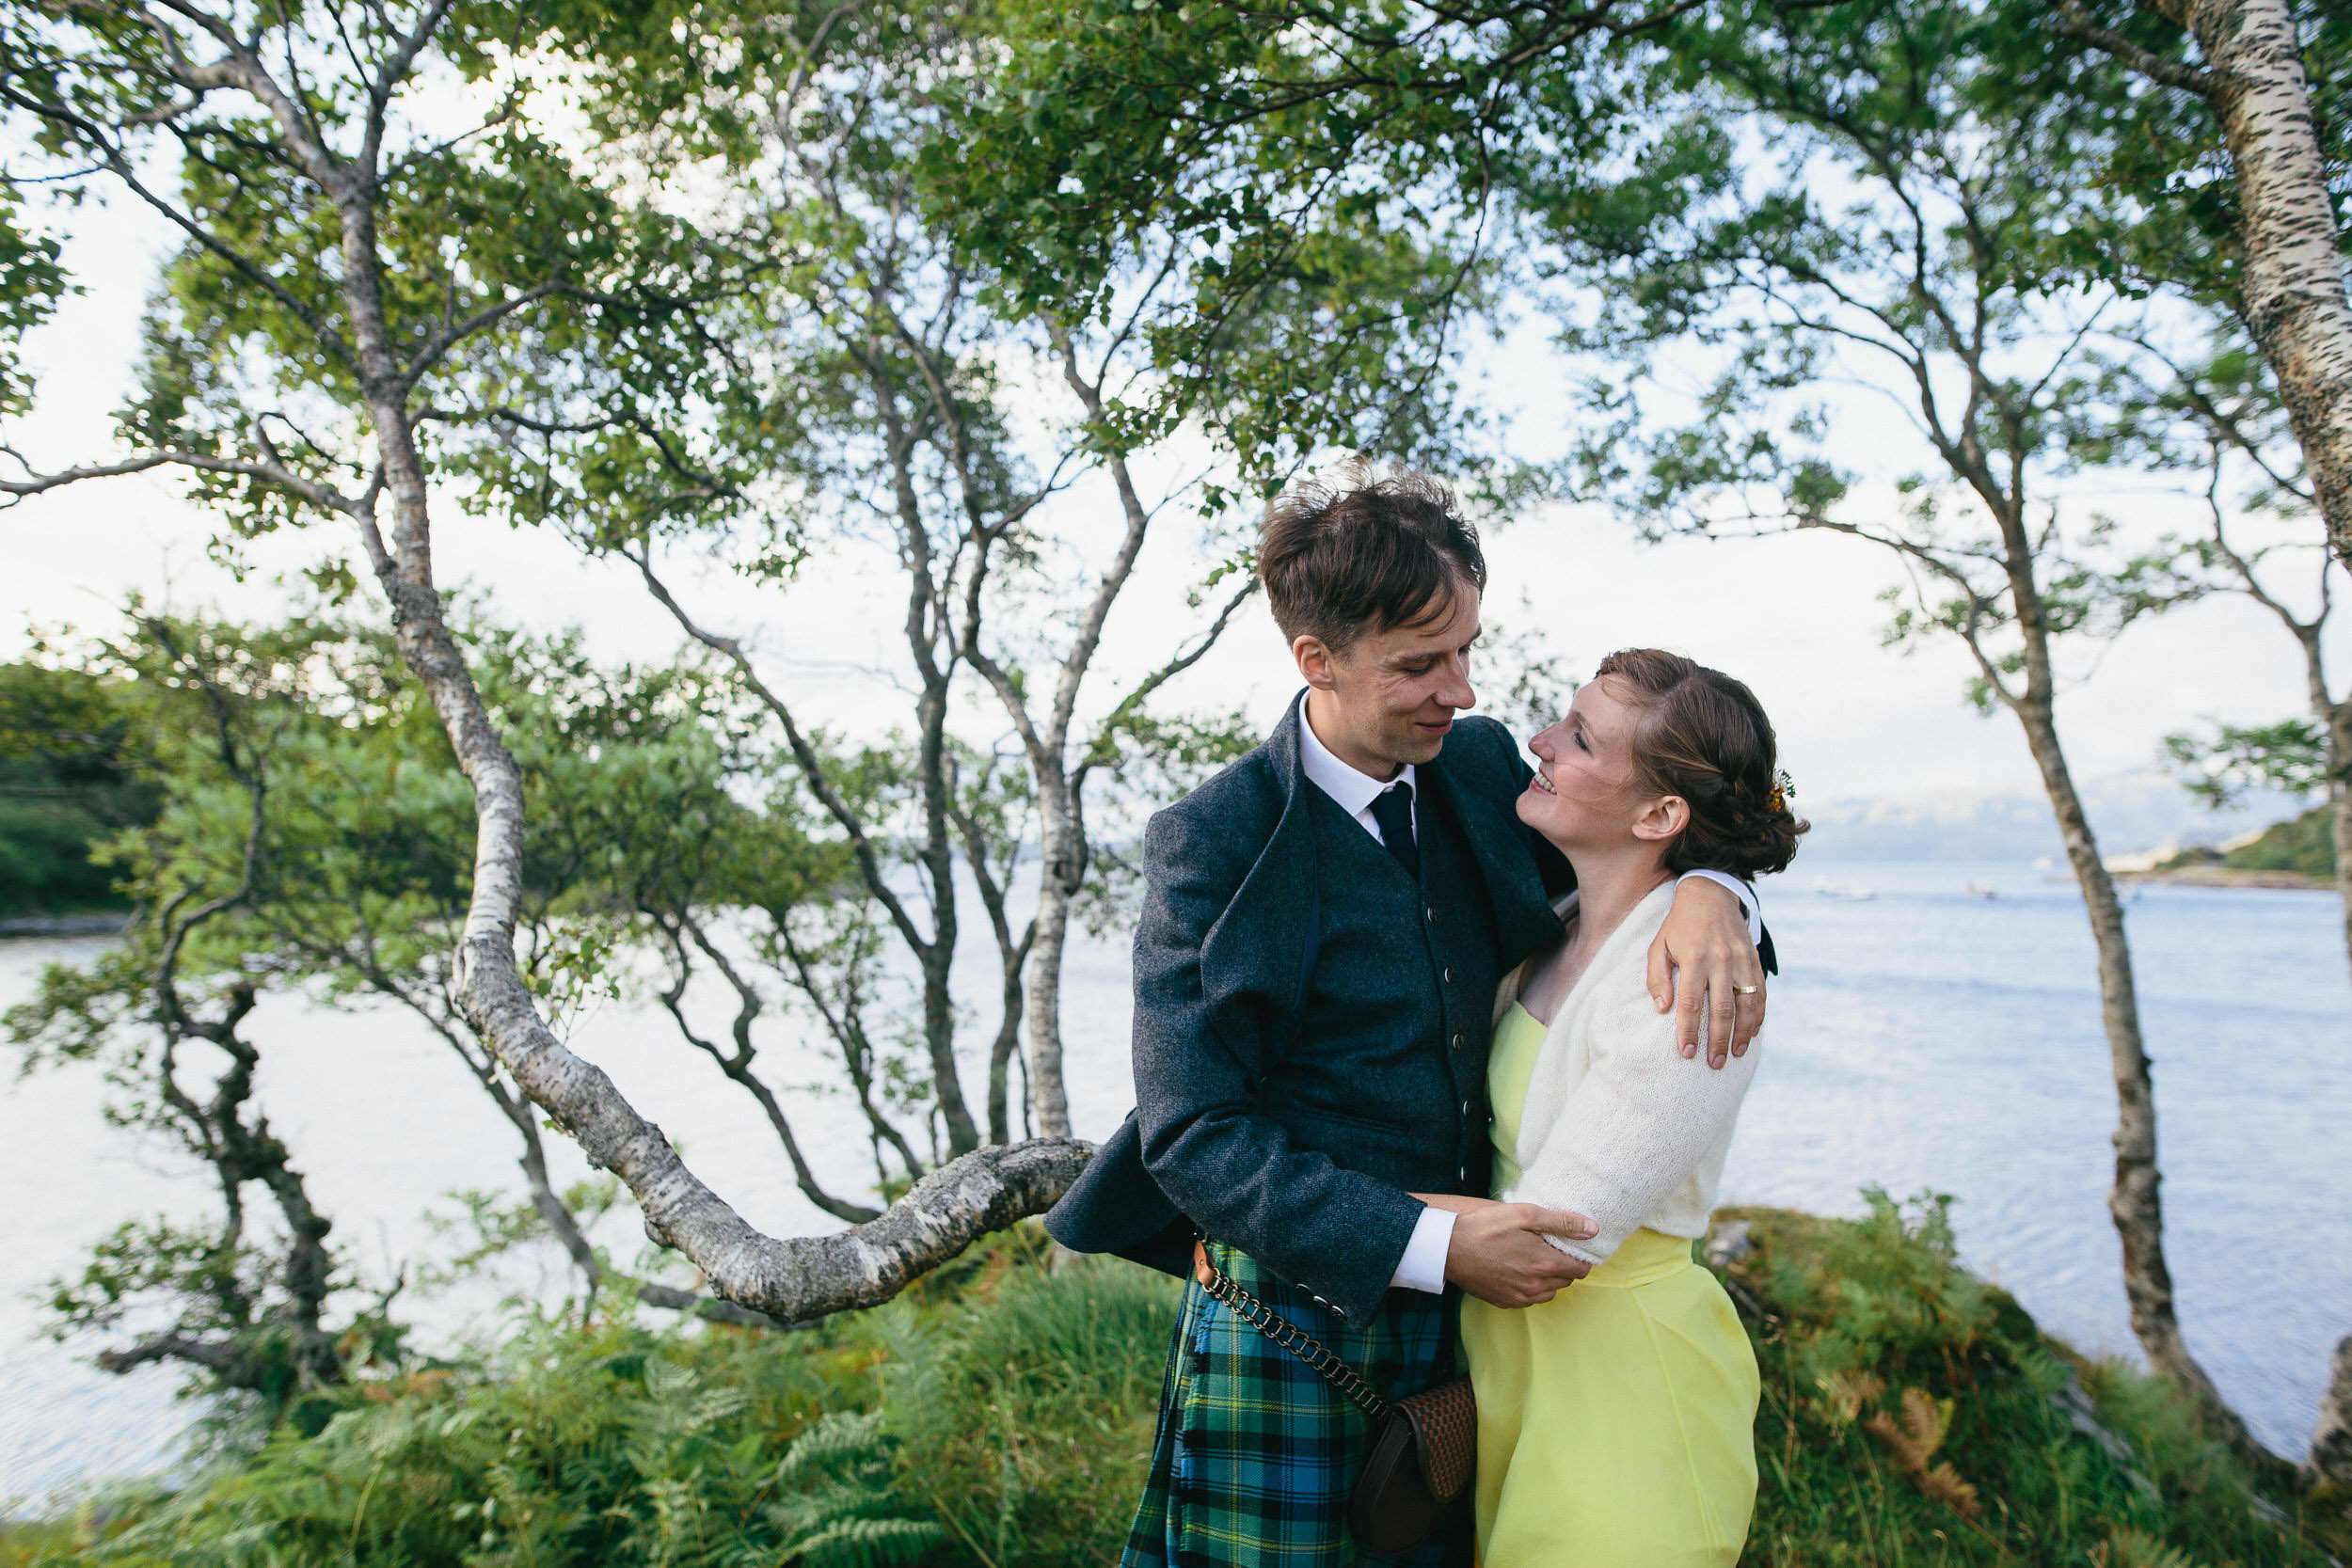 Quirky Wedding Photographer Scotland Glasgow Edinburgh Mirrorbox 179.jpg